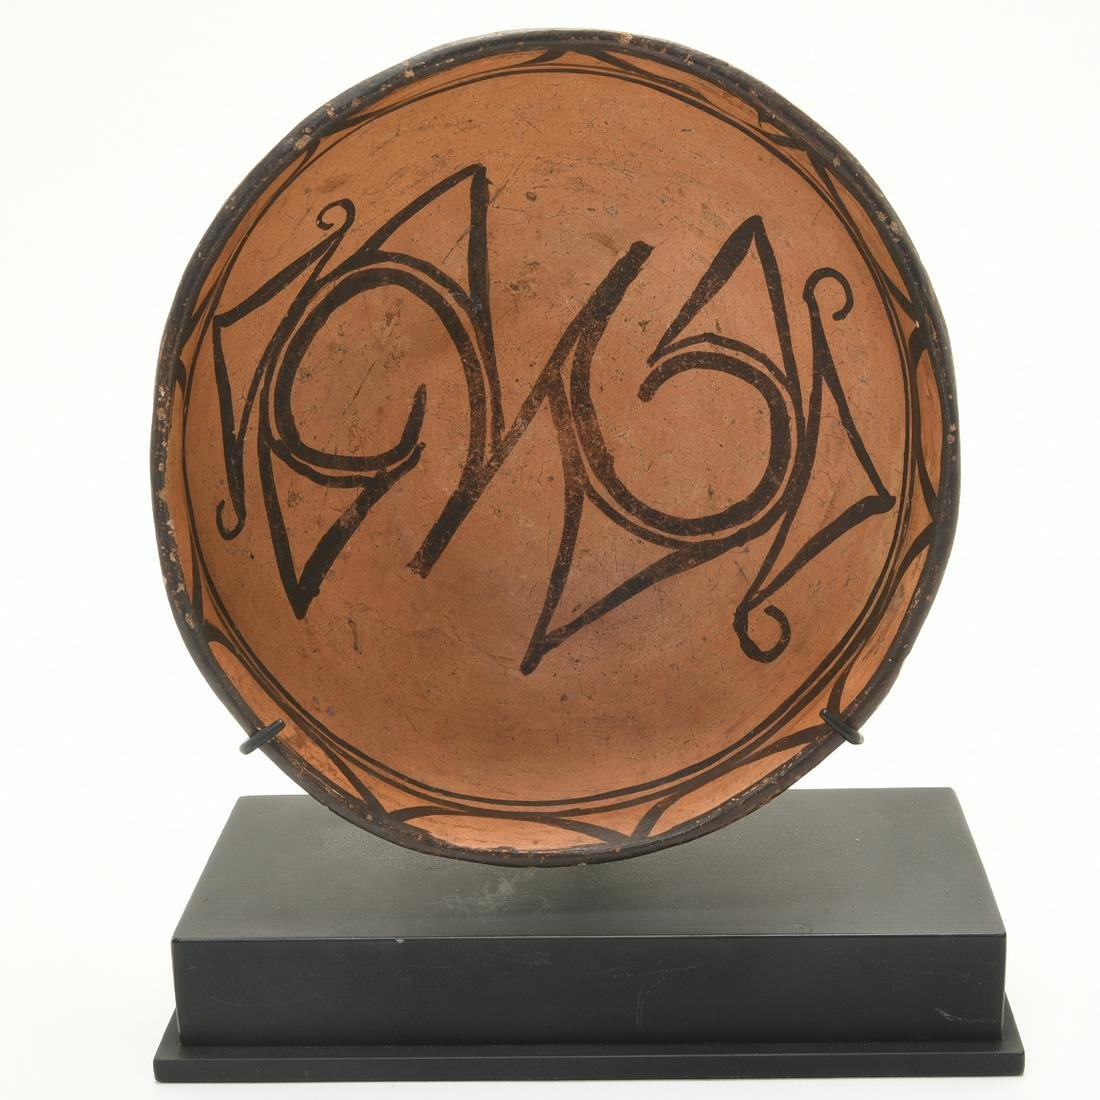 Late Anasazi Painted Ceramic Bowl.